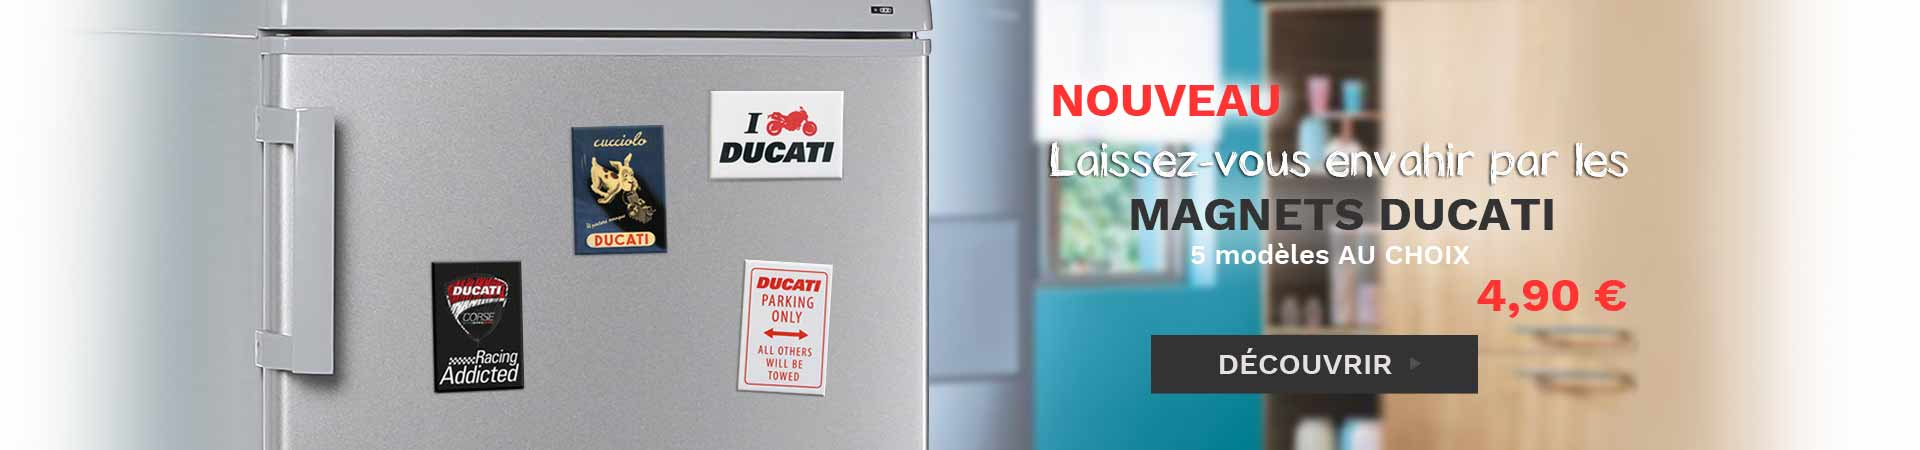 Magnet Ducati